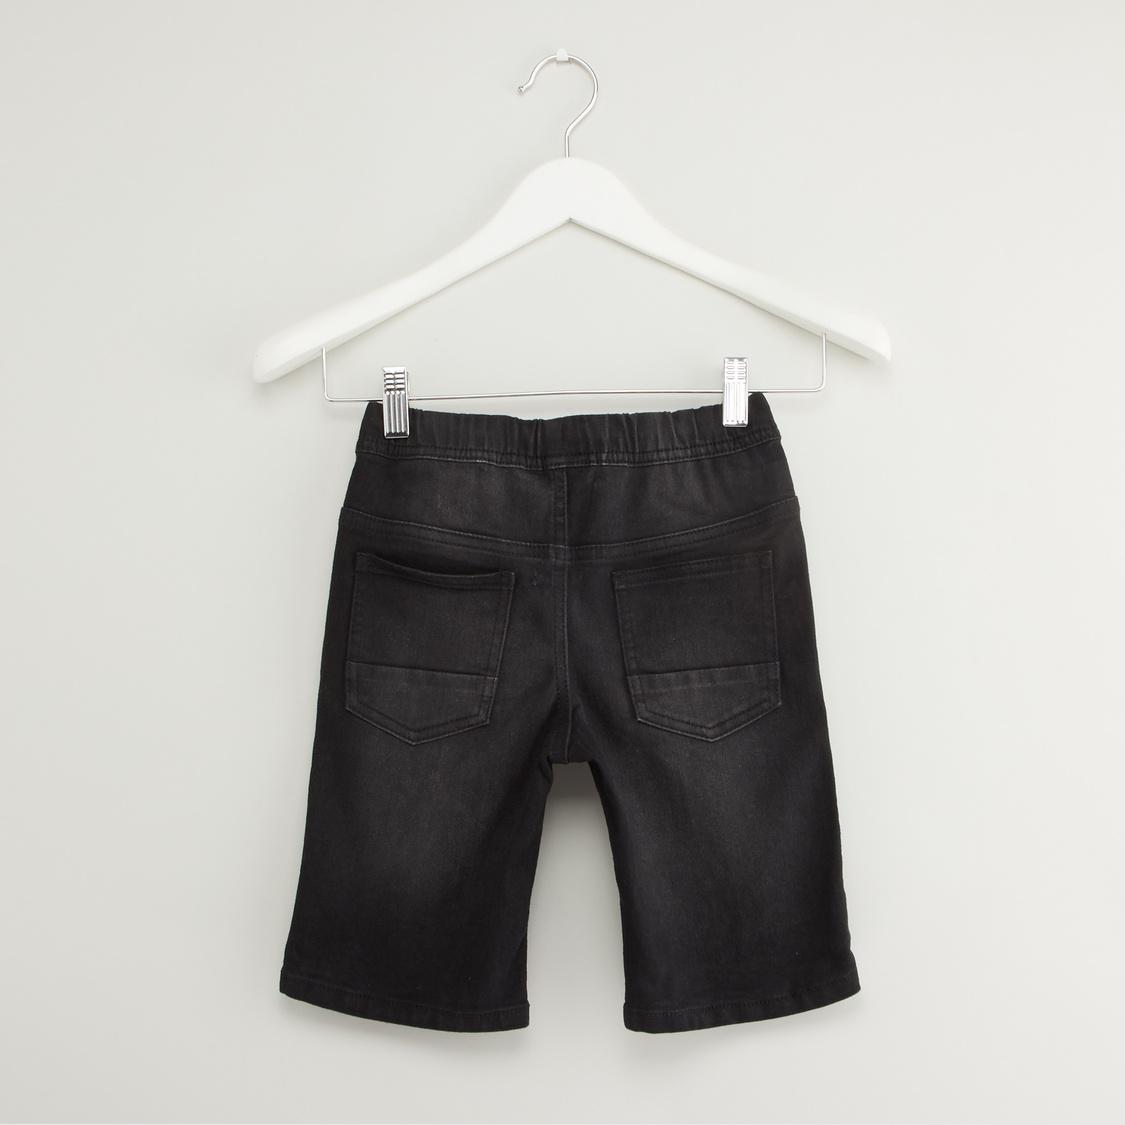 Printed Cut and Sew T-shirt and Denim Shorts Set